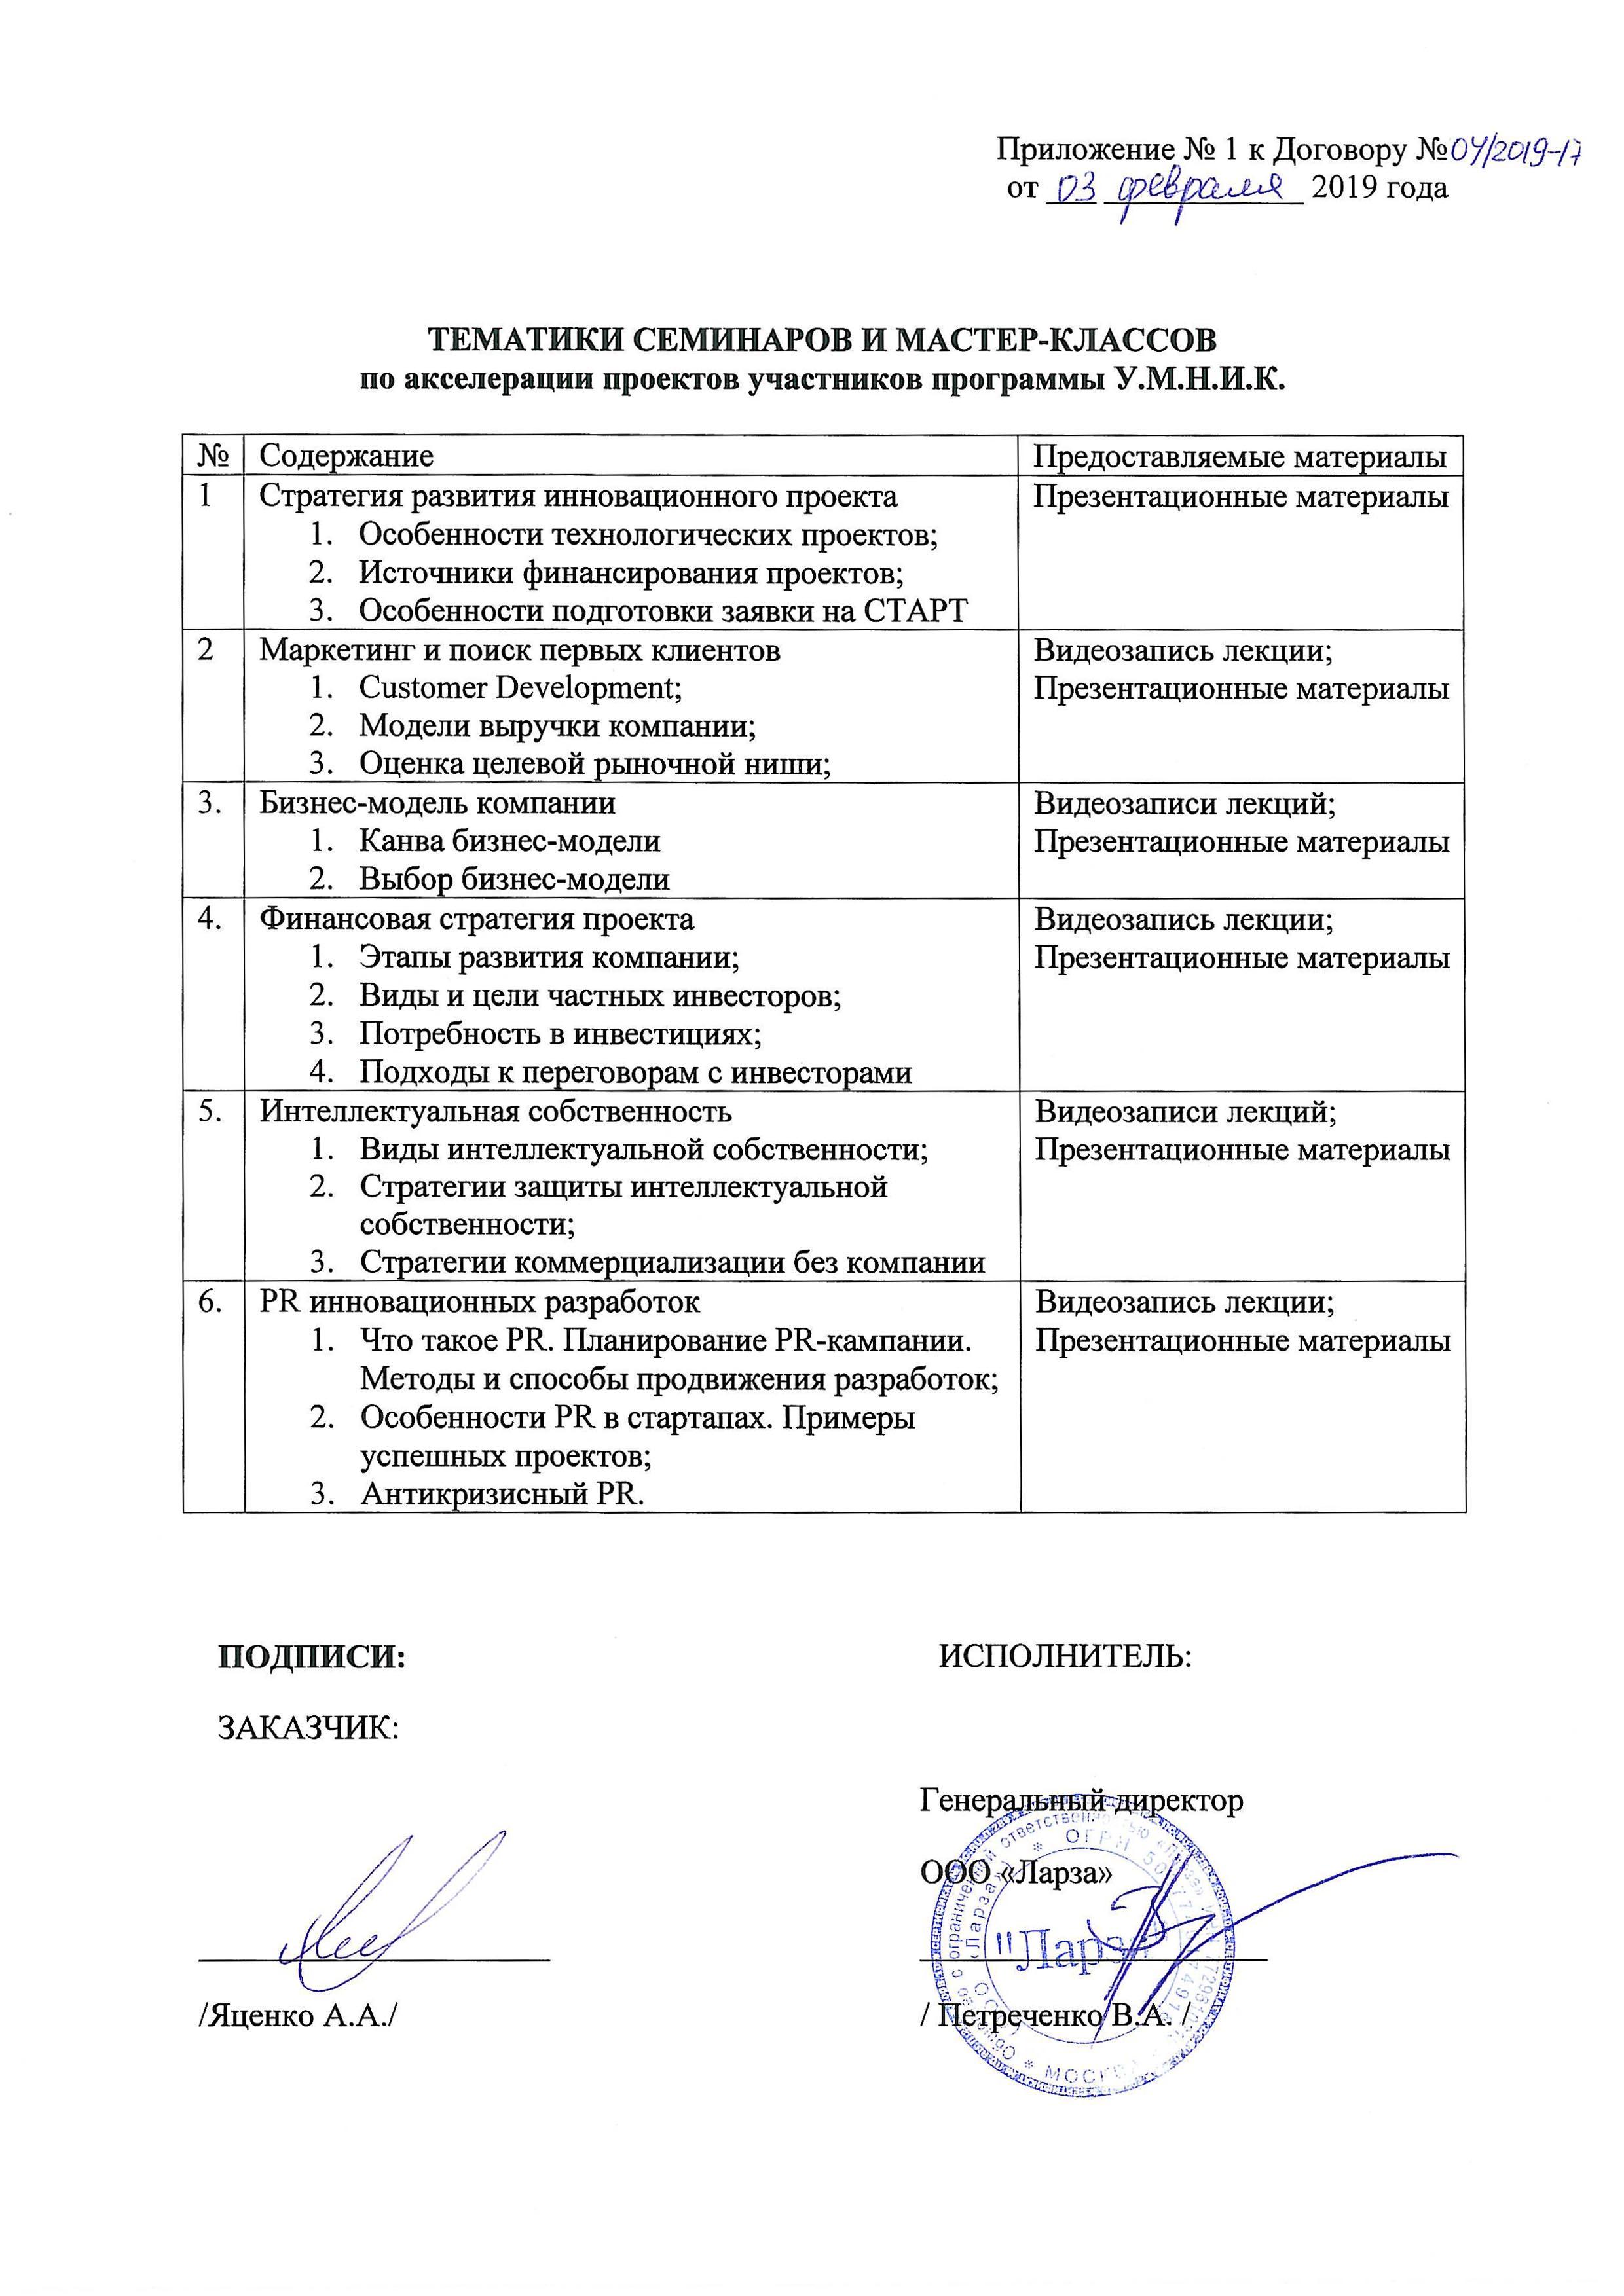 Темы курса преакселерации научного парка МГУ